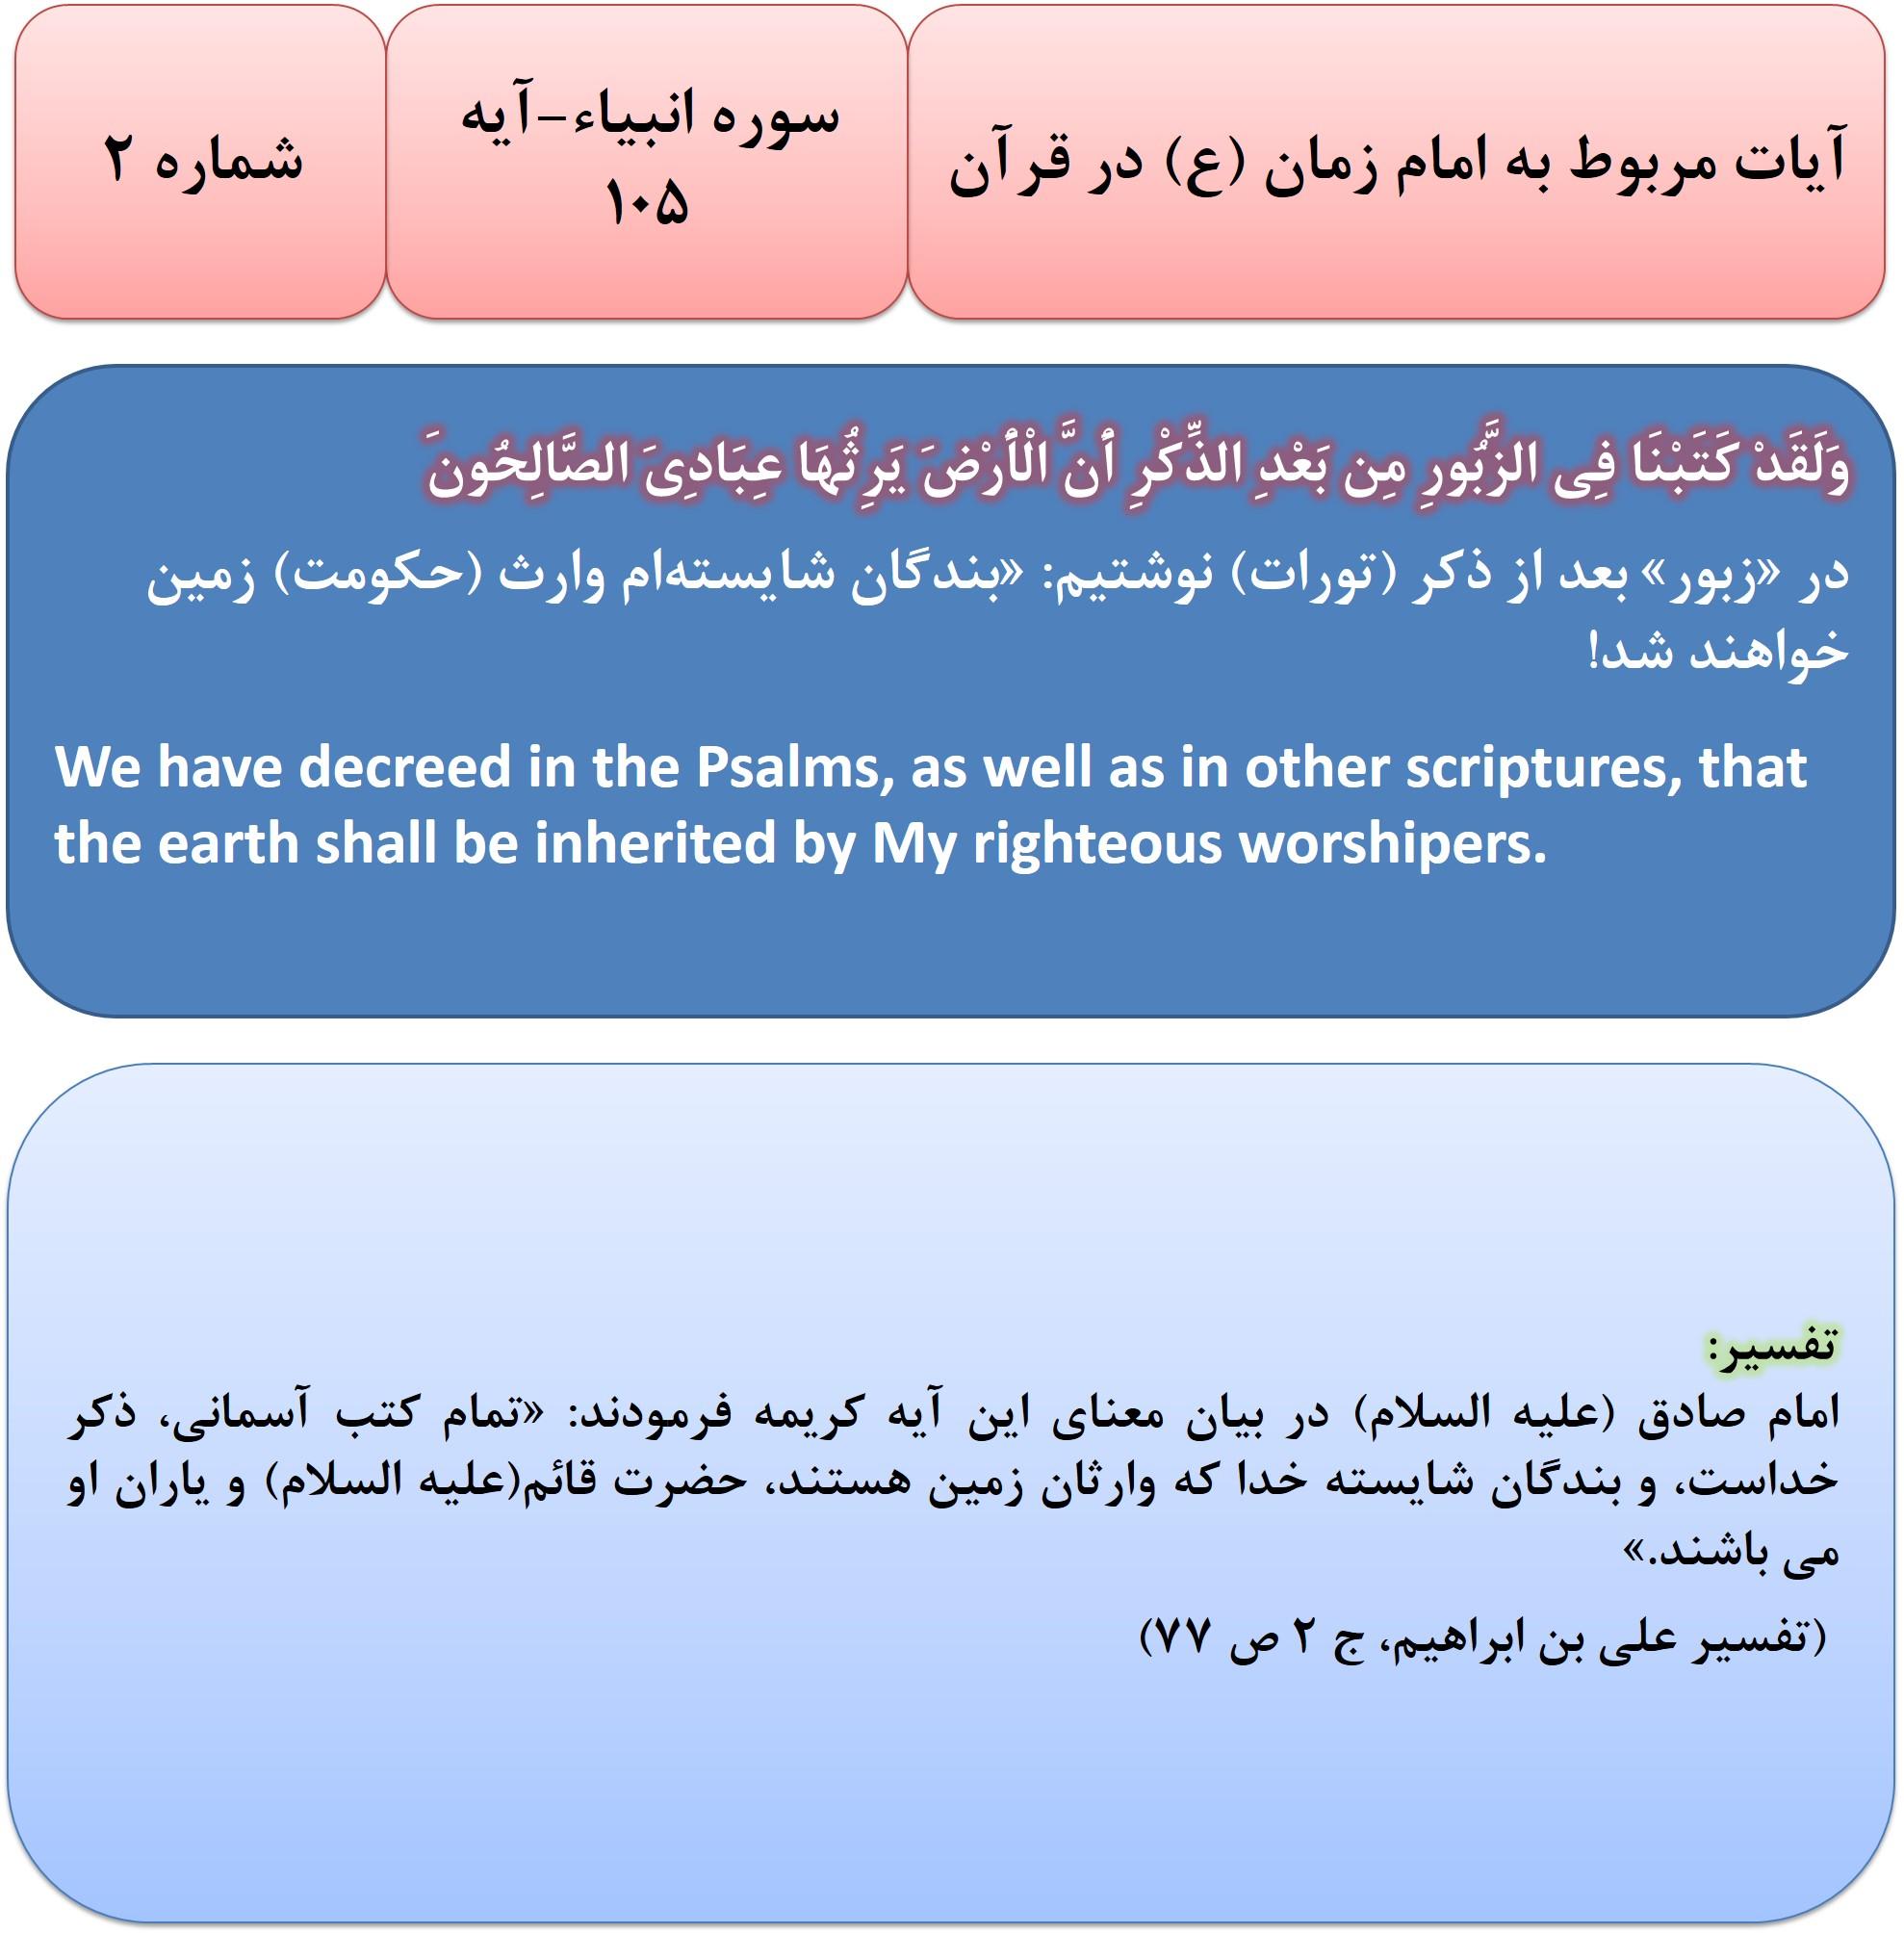 http://bayanbox.ir/view/5802877088627168444/Mahdi-In-Quran-2.jpg